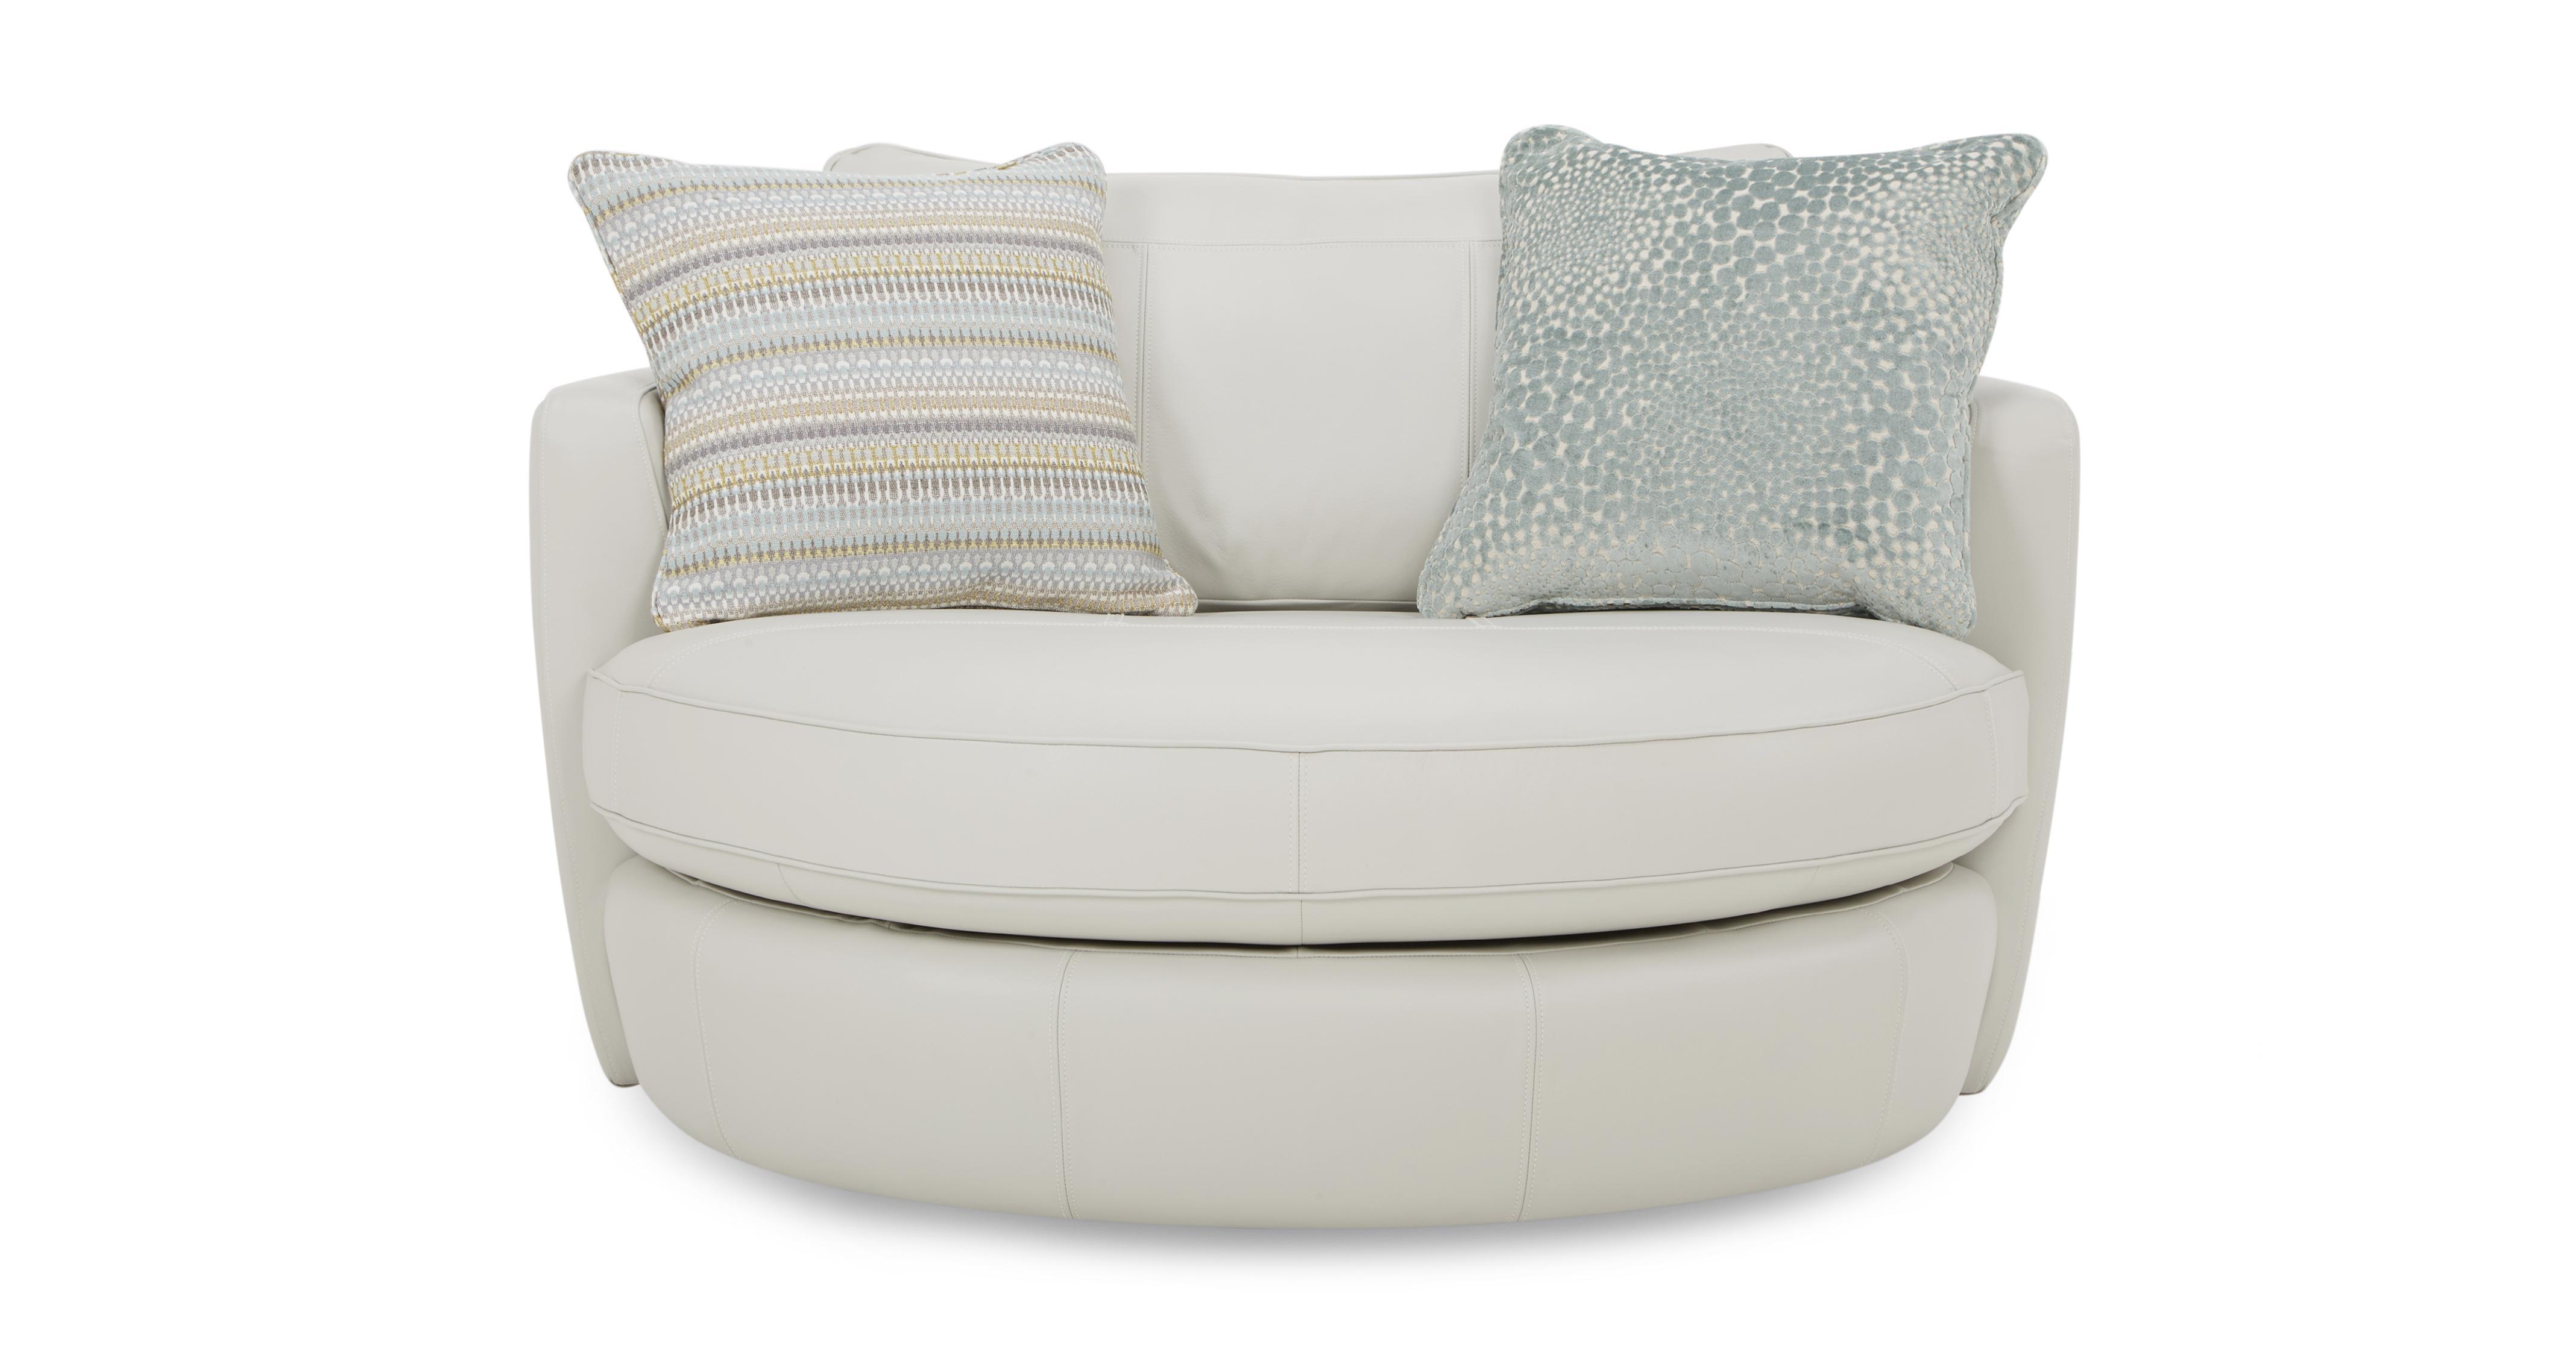 Sophia leather cuddler swivel chair dfs - Sophia Leather Cuddler Swivel Chair Dfs